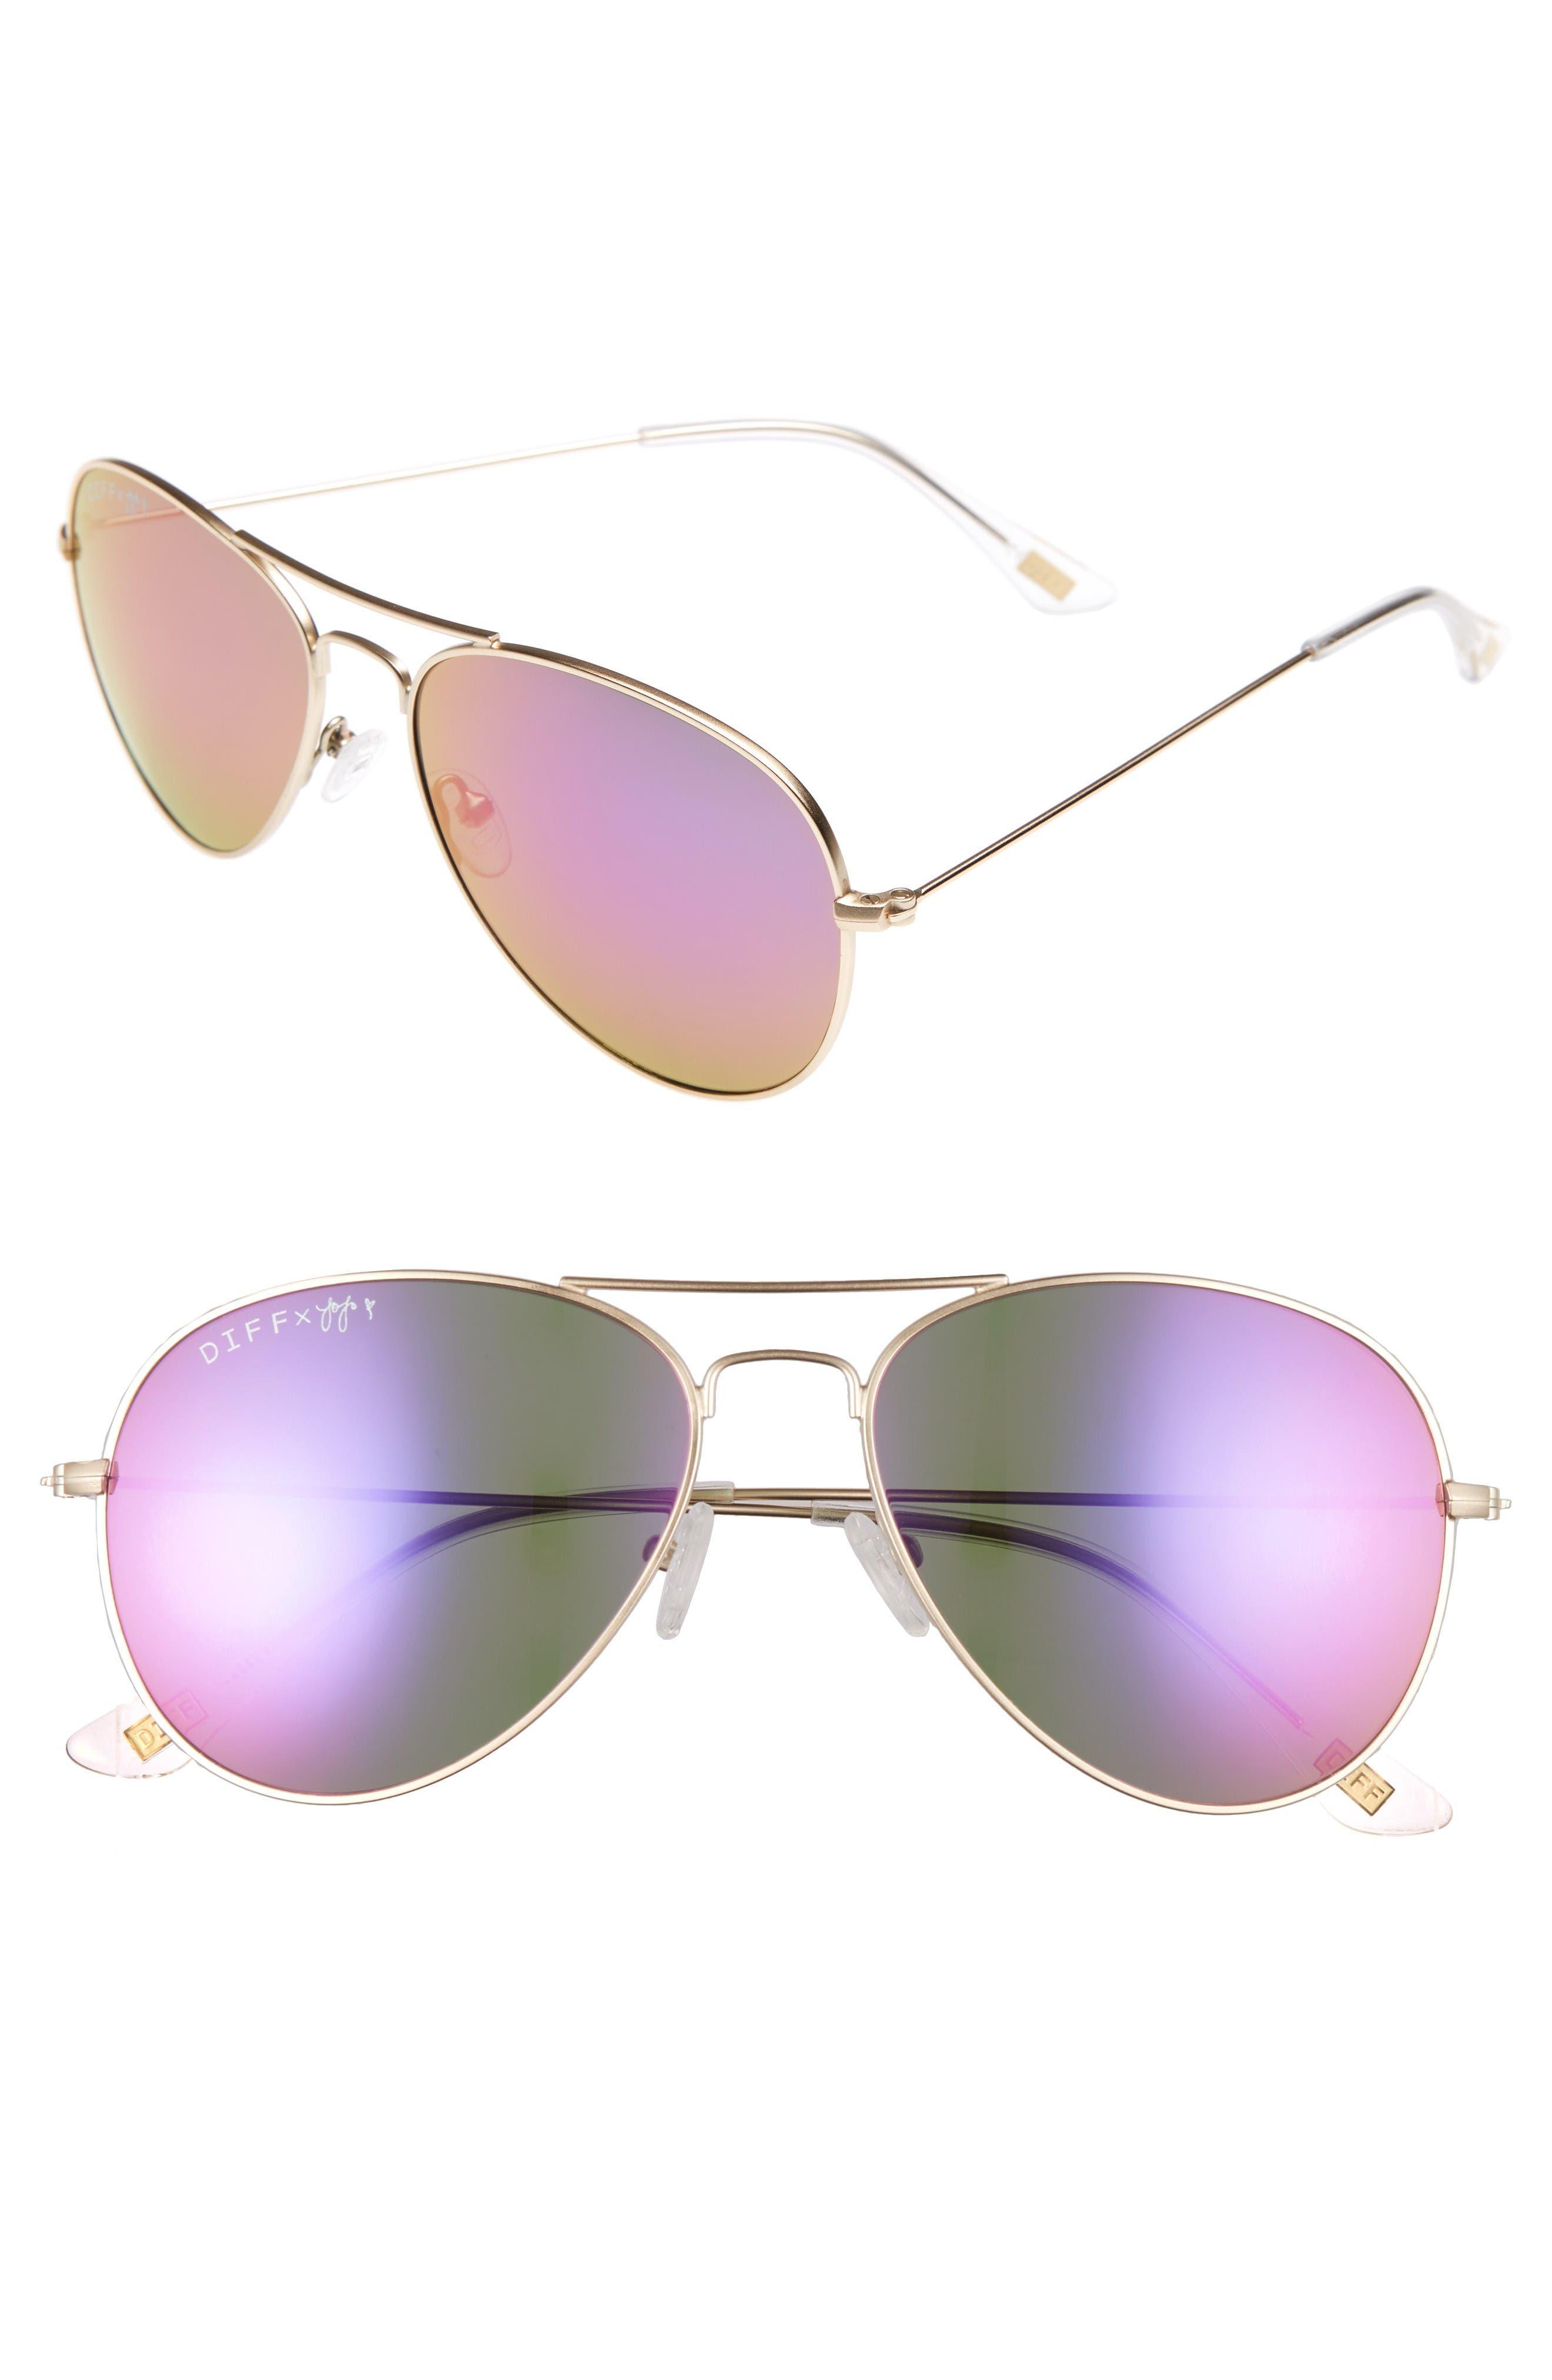 Alternate Image 1 Selected - DIFF x JoJo Cruz Edition 57mm Aviator Sunglasses